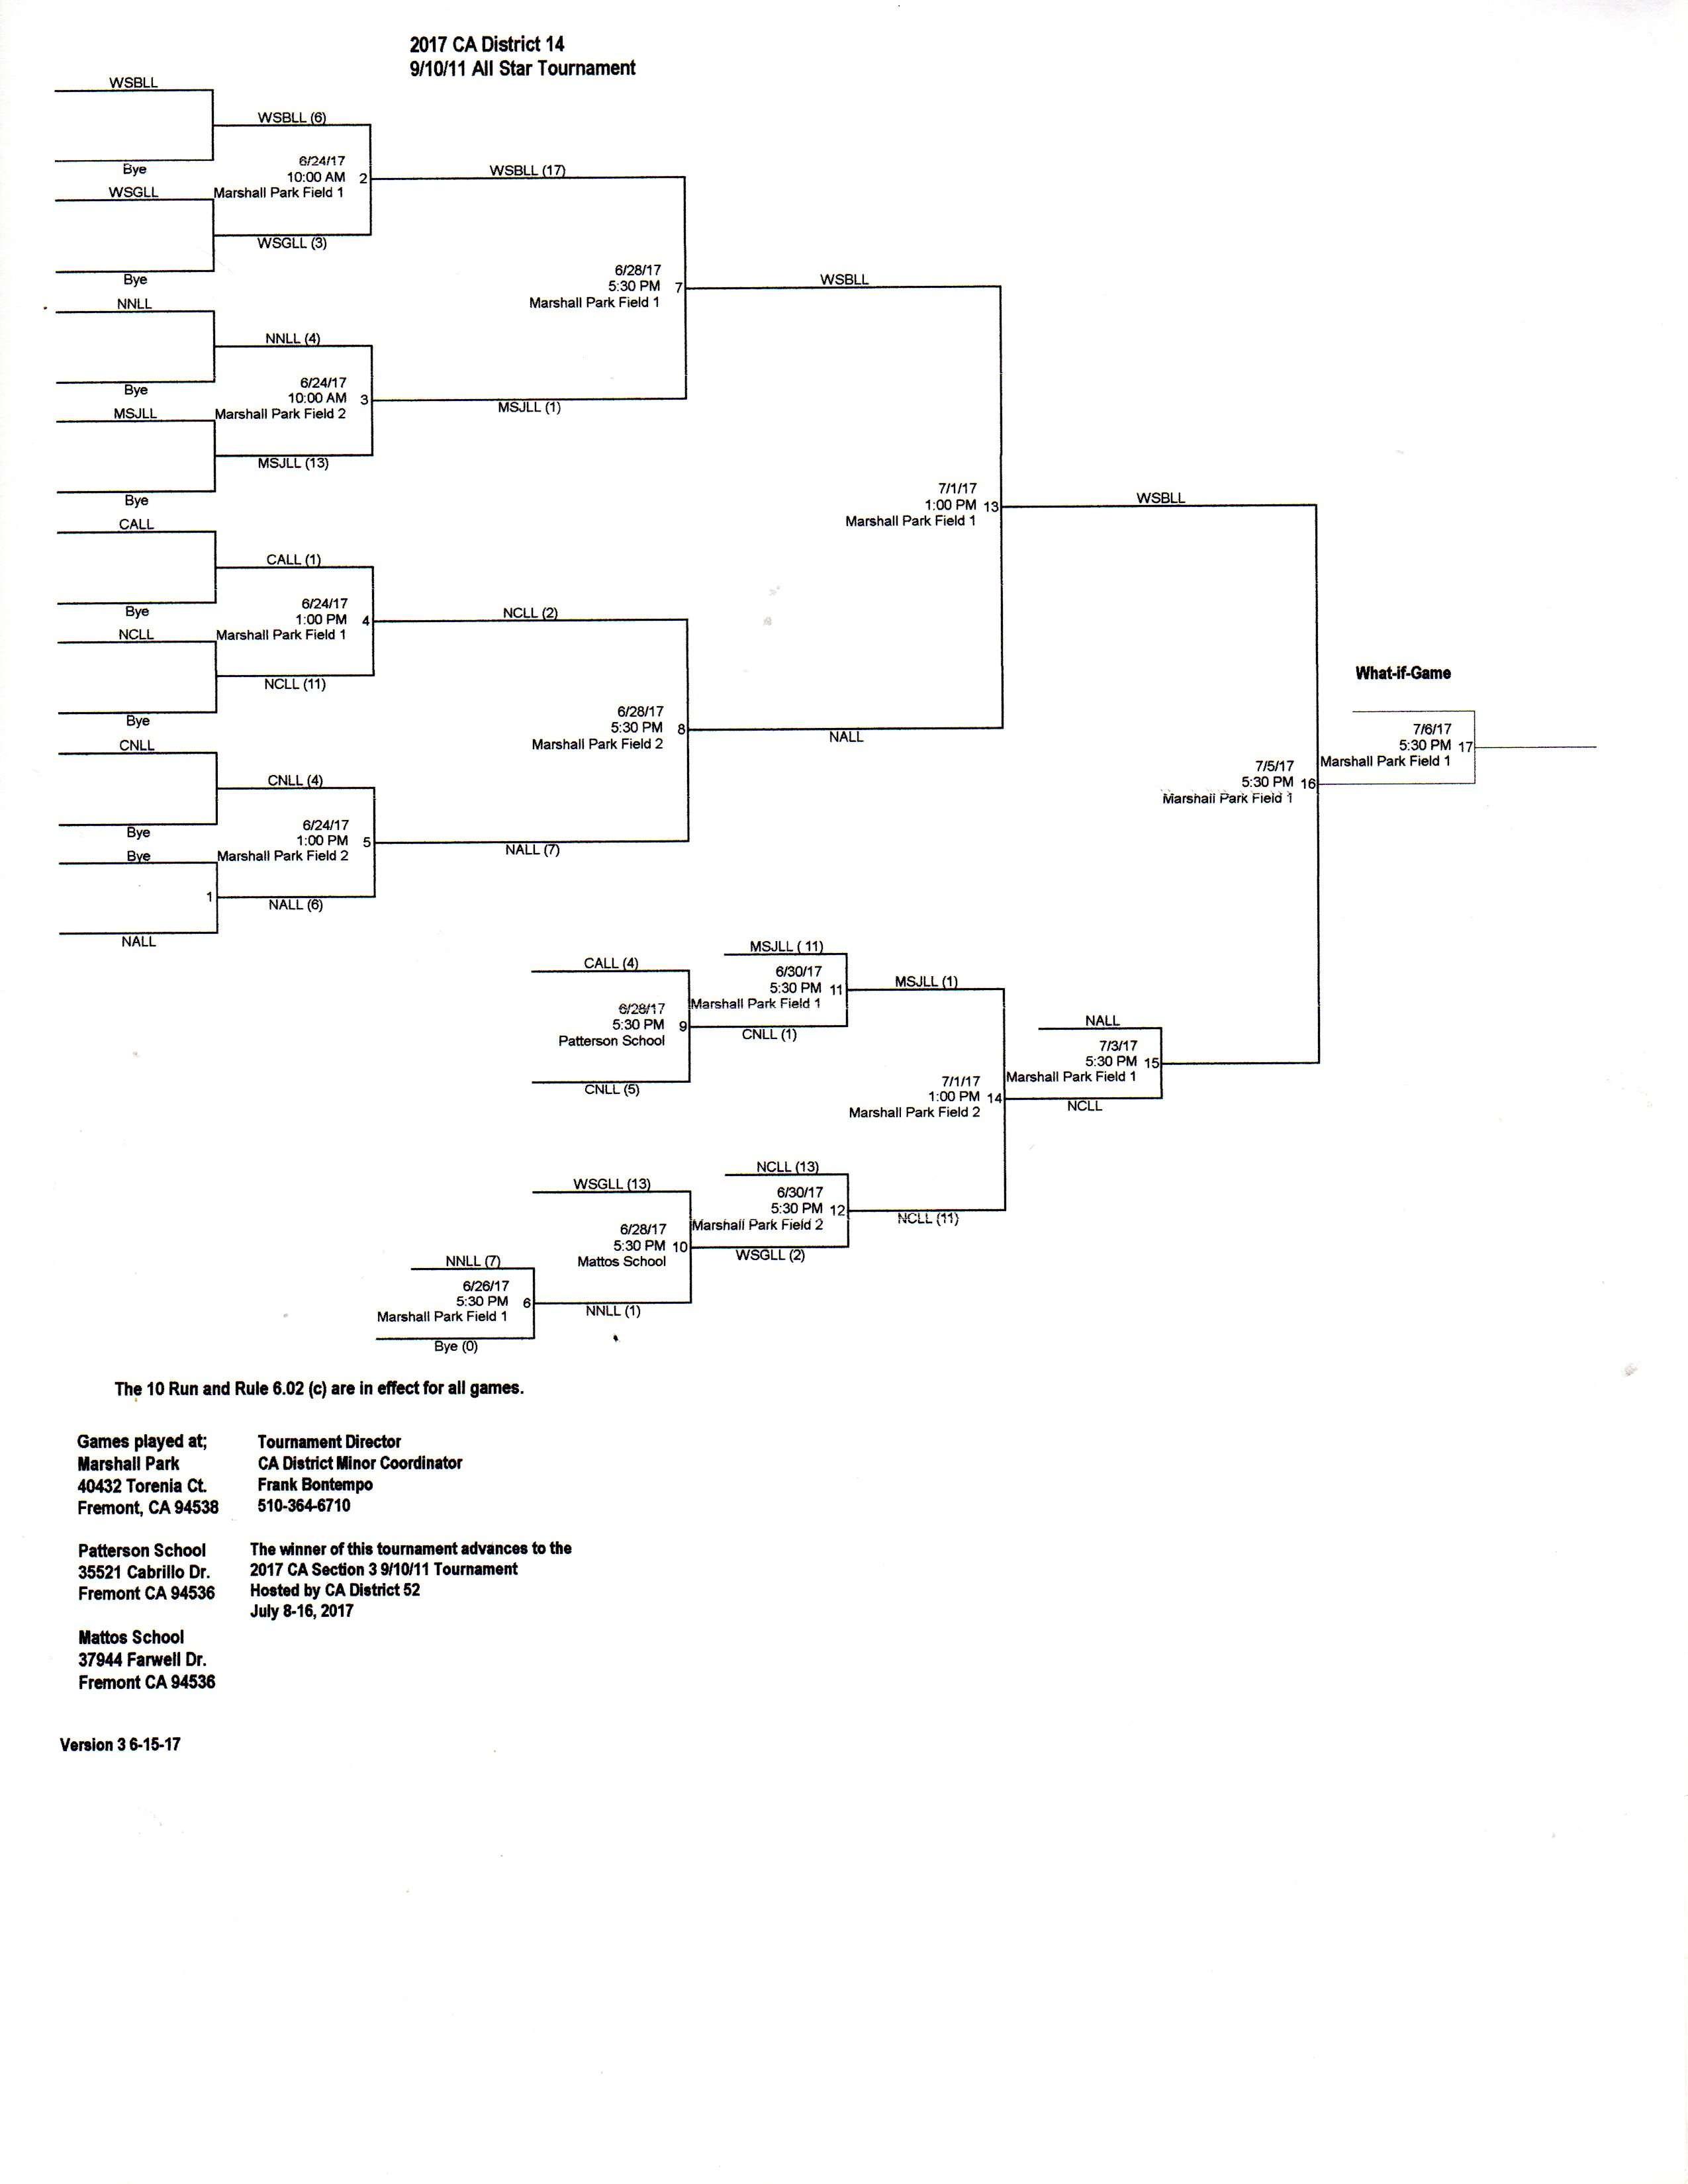 2017 CA District 14 9-10-11 Tournament